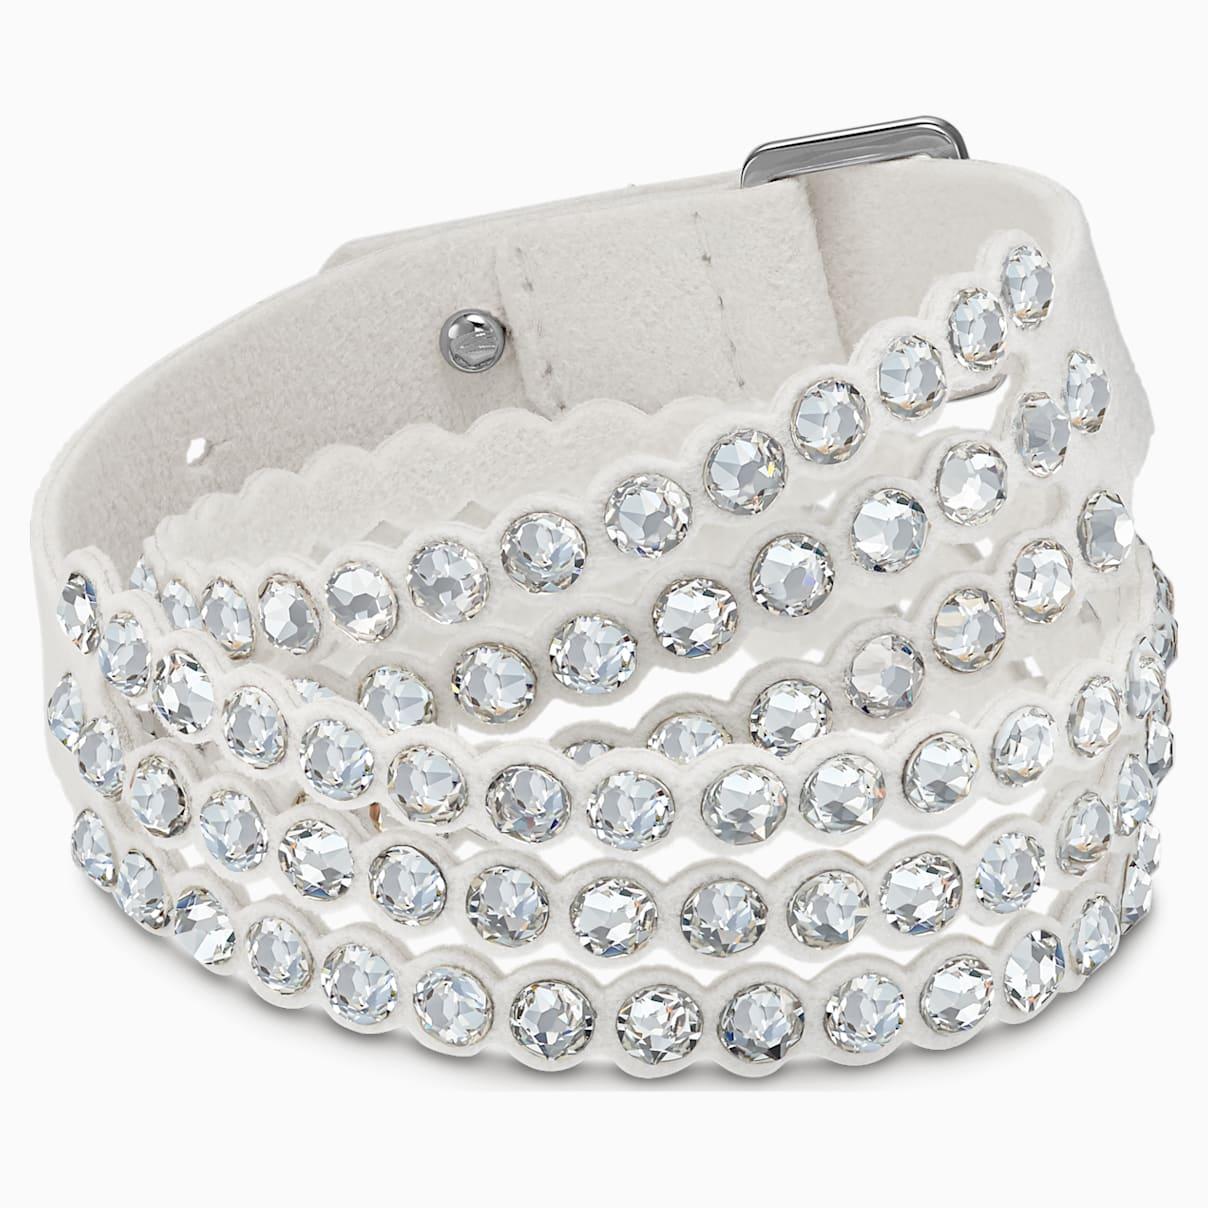 Swarovski Swarovski Power Collection Bracelet, White from Swarovski - The  Magic of Crystal | Accuweather